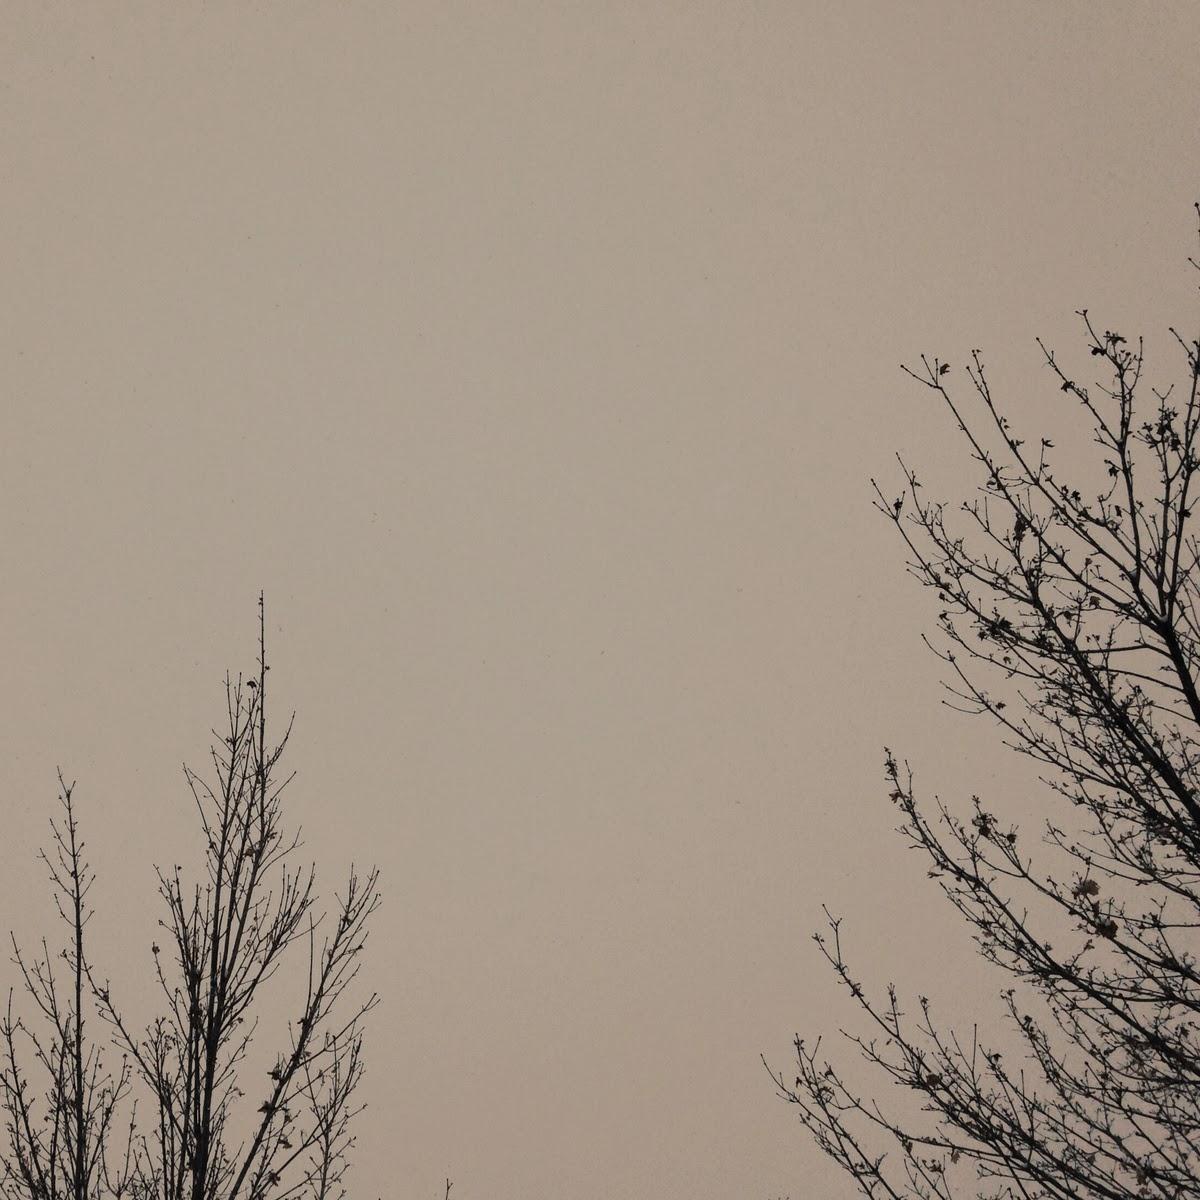 Darren Harper - Autumnal Fragments & Sketches